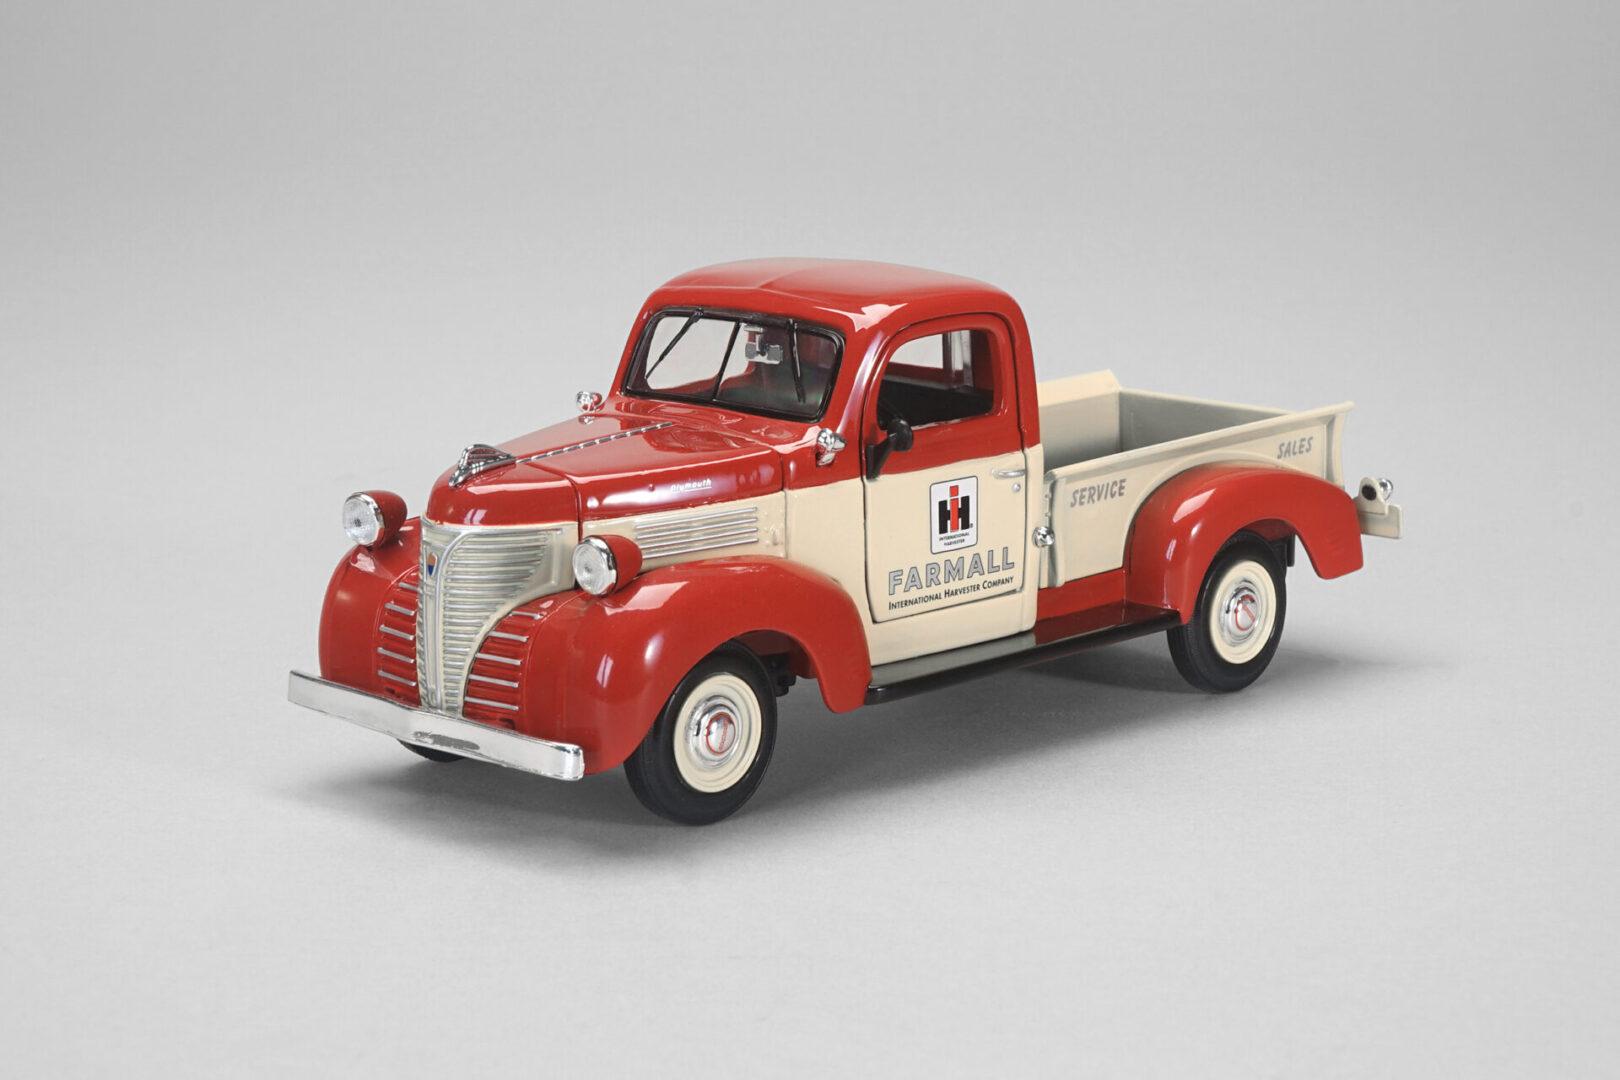 zjd-1858-1-24-farmall-1941-plymouth-pickup